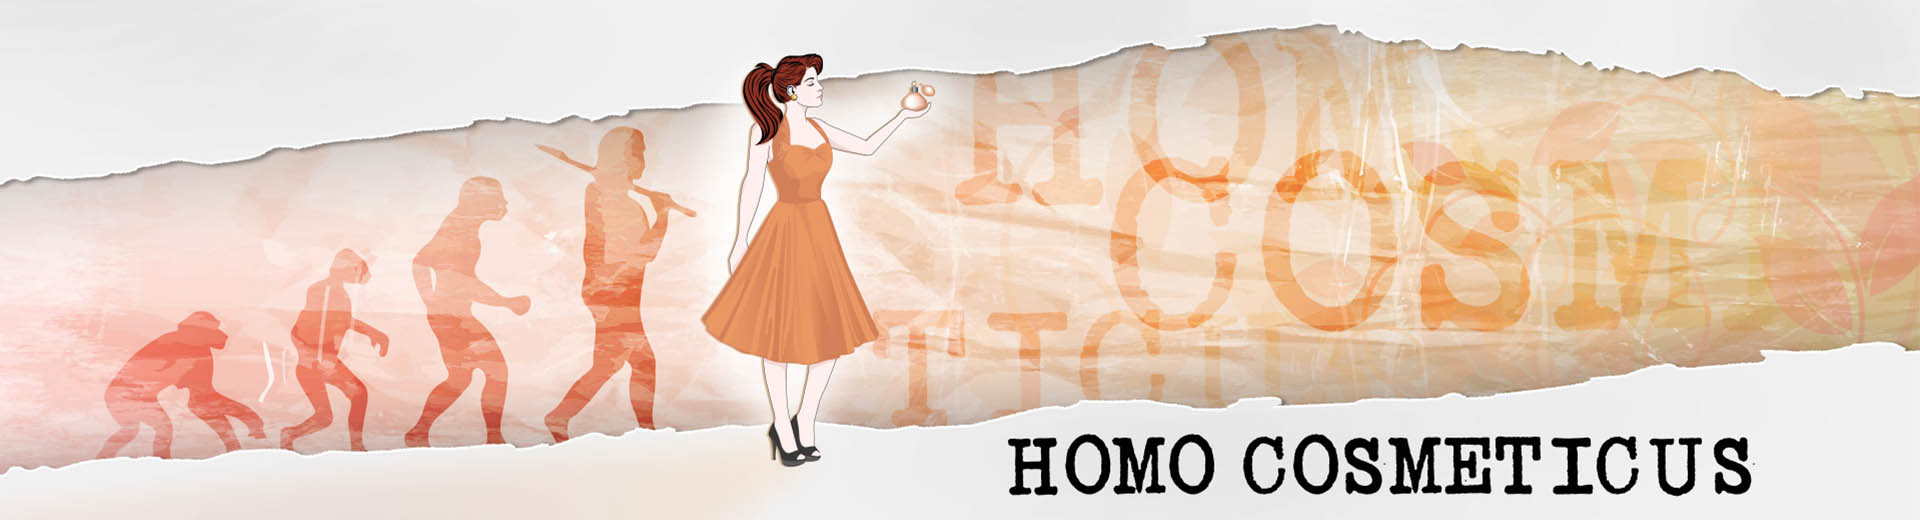 homocosmeticus_banner